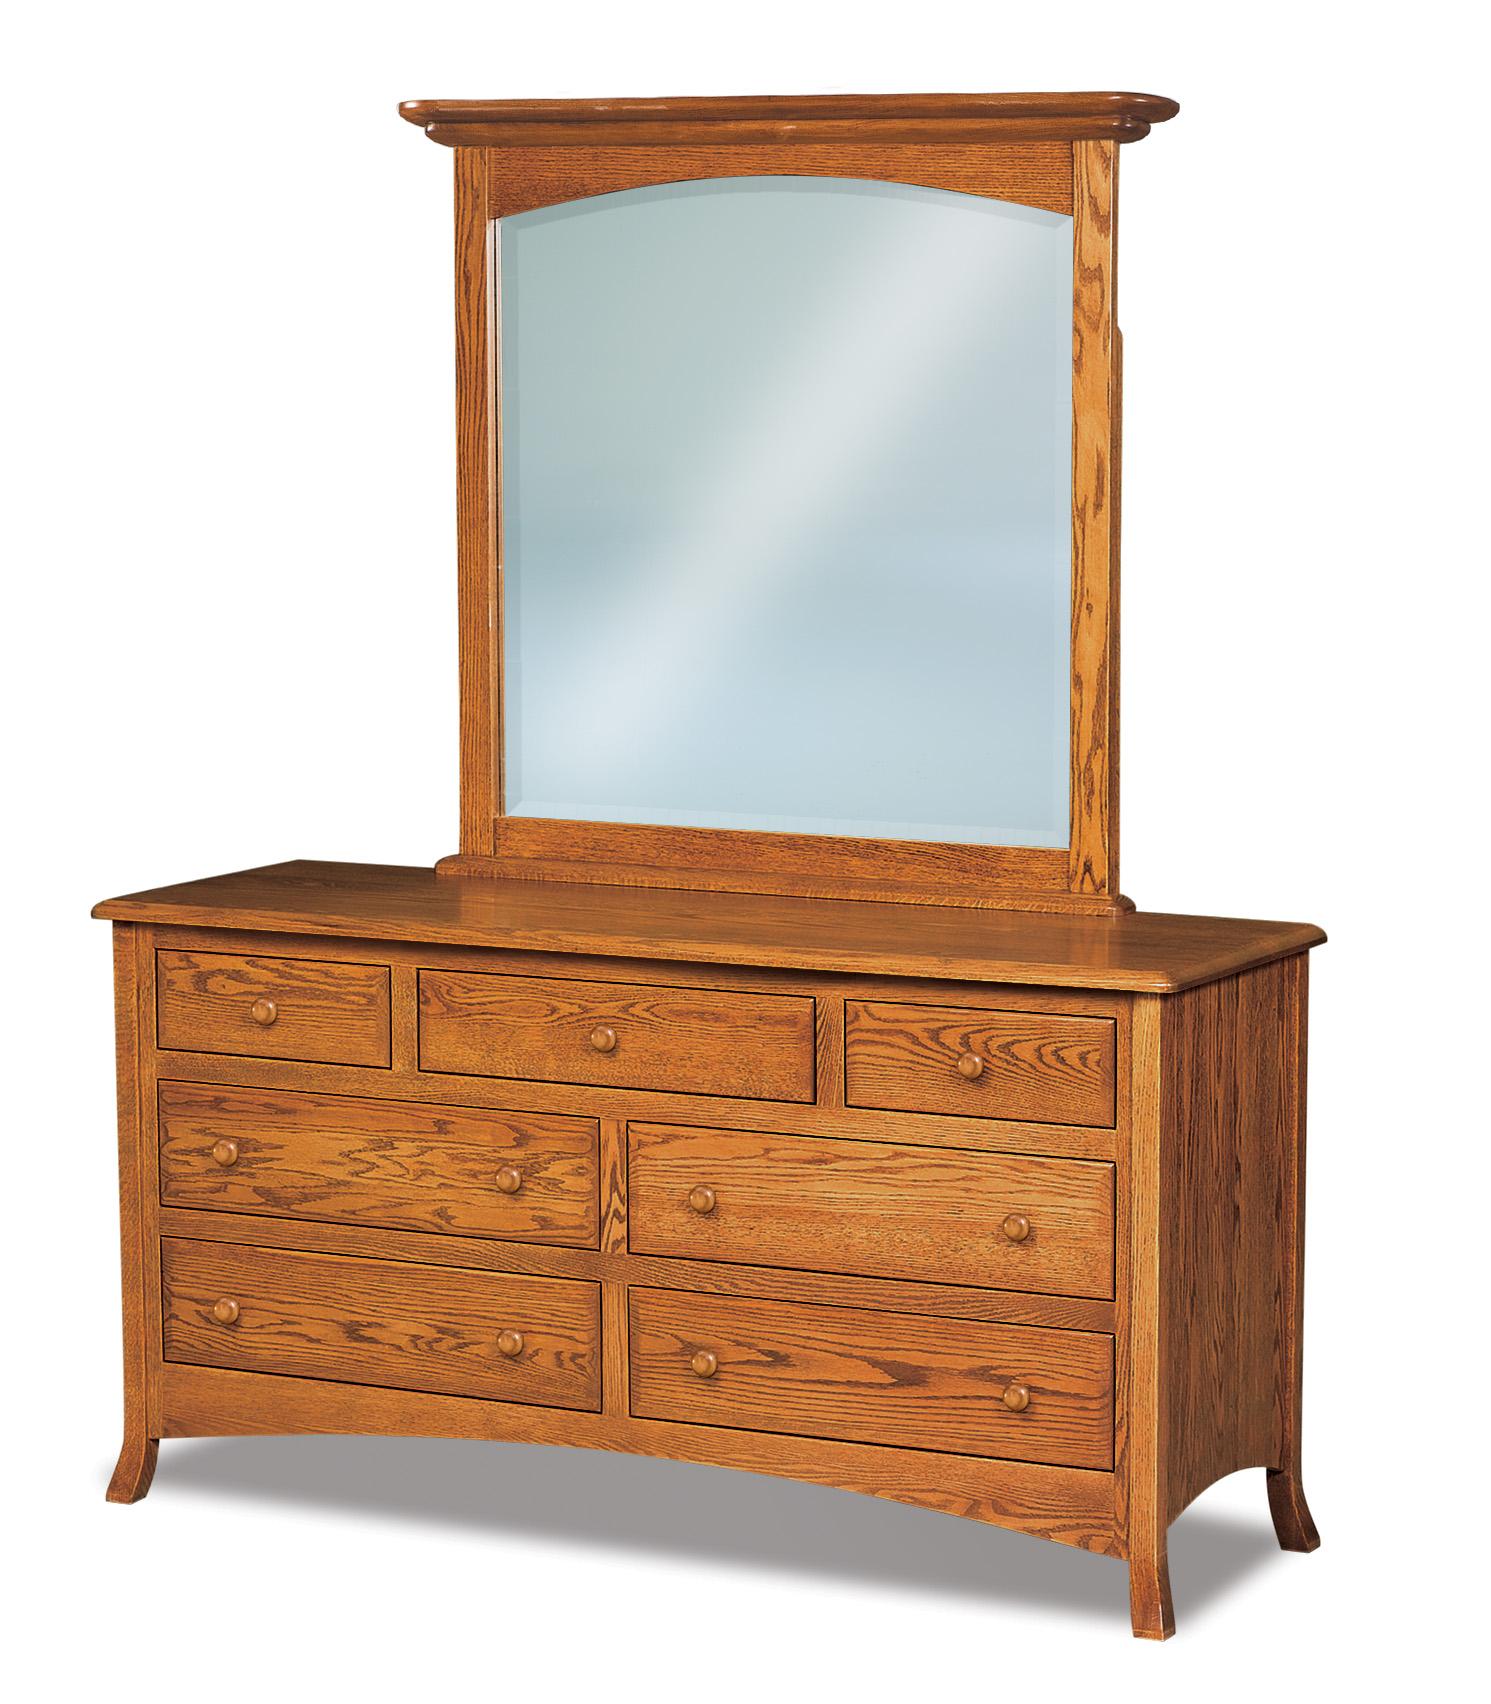 Carlisle 7 Drawer Dressers Amish Furniture Store Mankato Mn